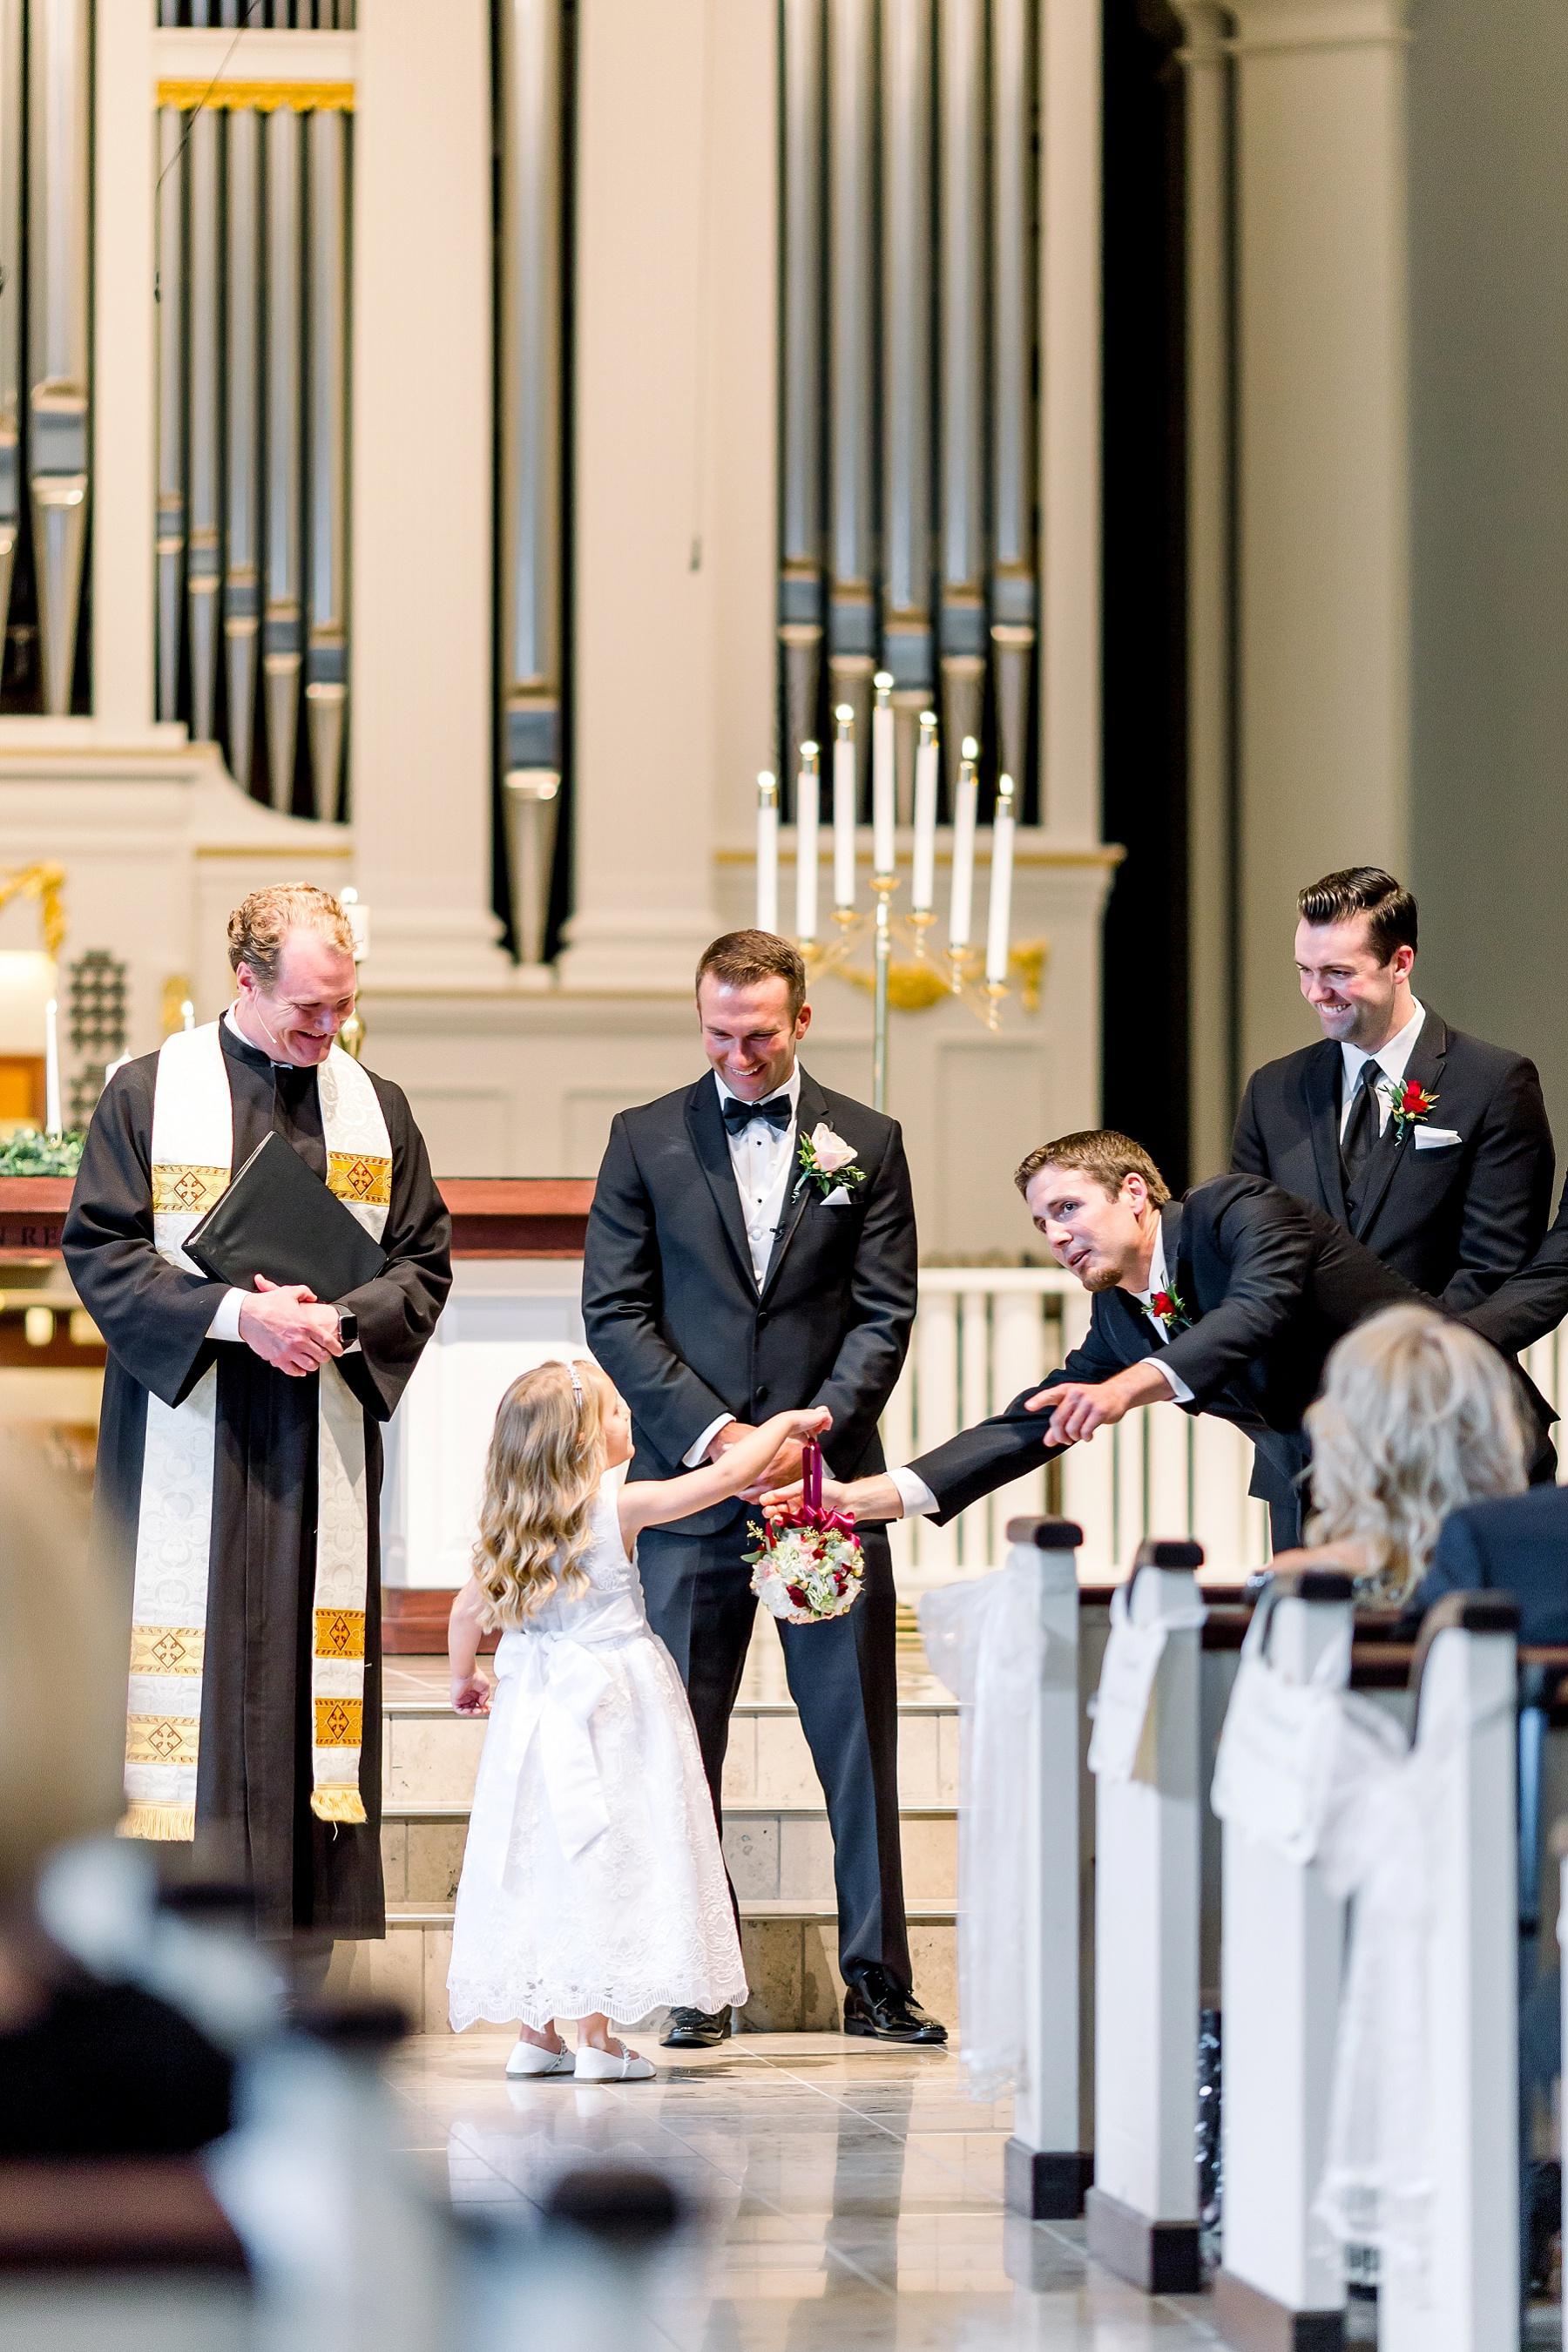 midwest-adventurous-wedding-photographer-elizabeth-ladean-photography-photo_4755.jpg